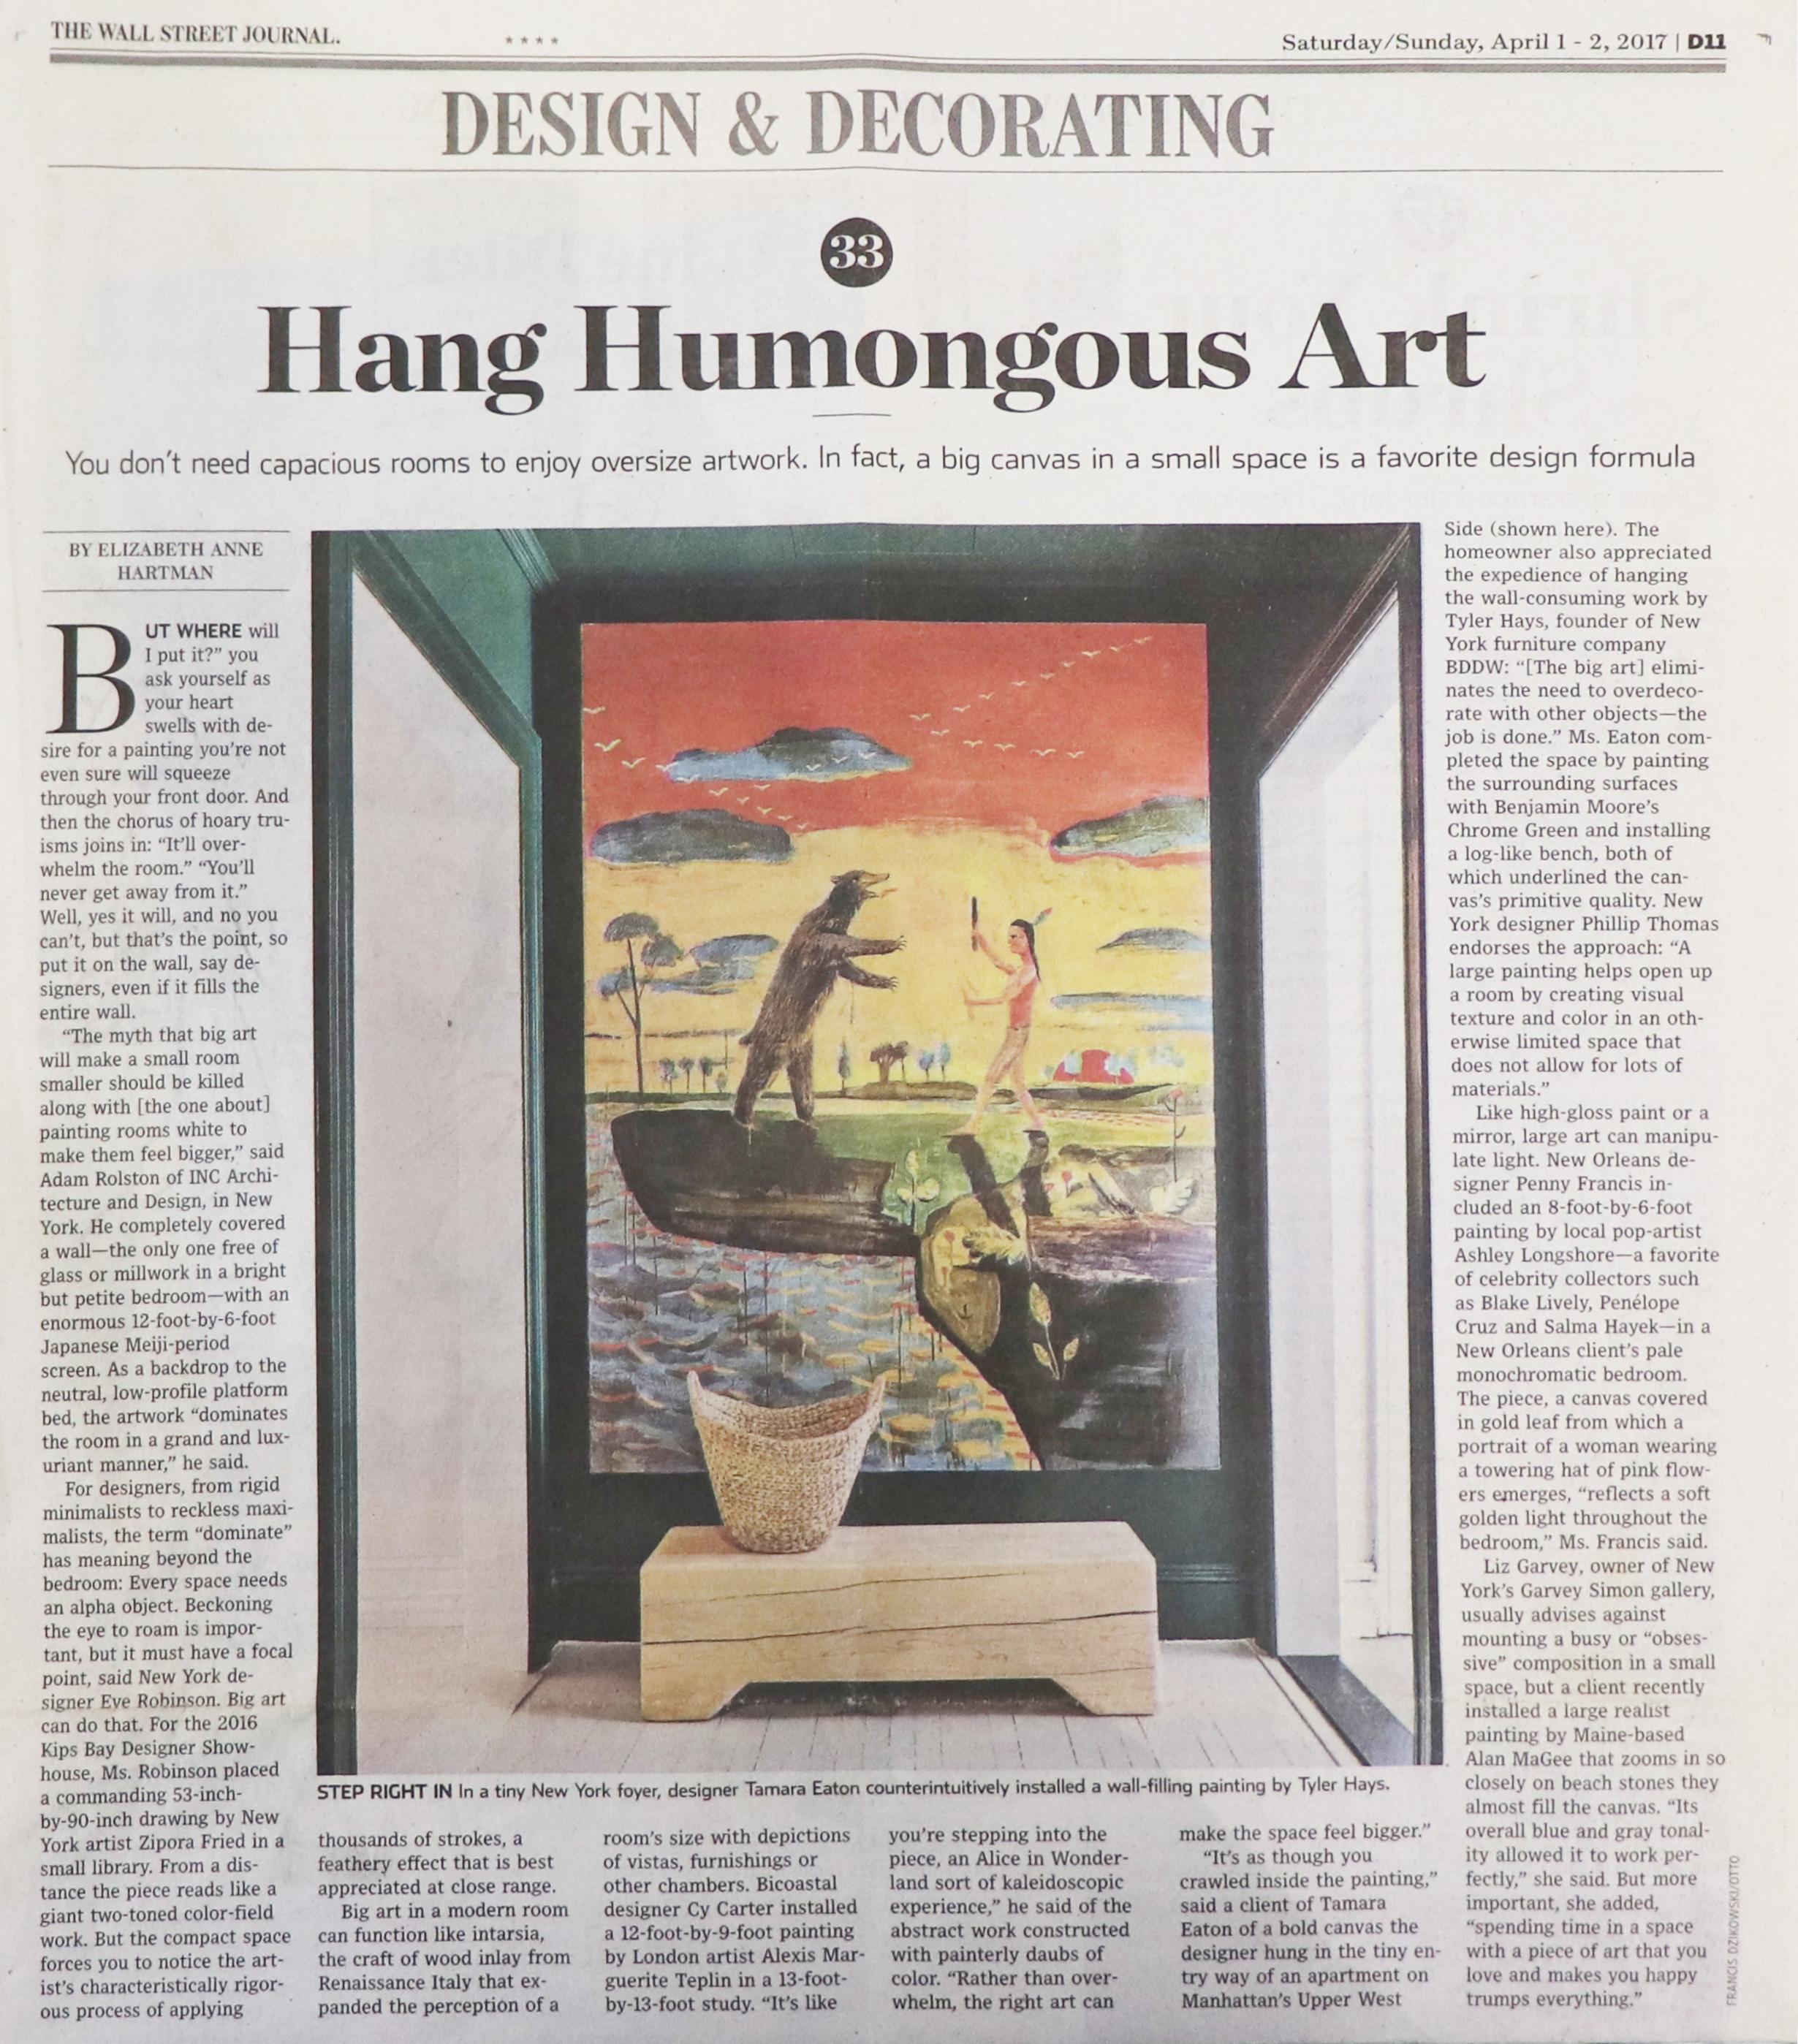 Hang-Humongous-Art_Article copy.jpg